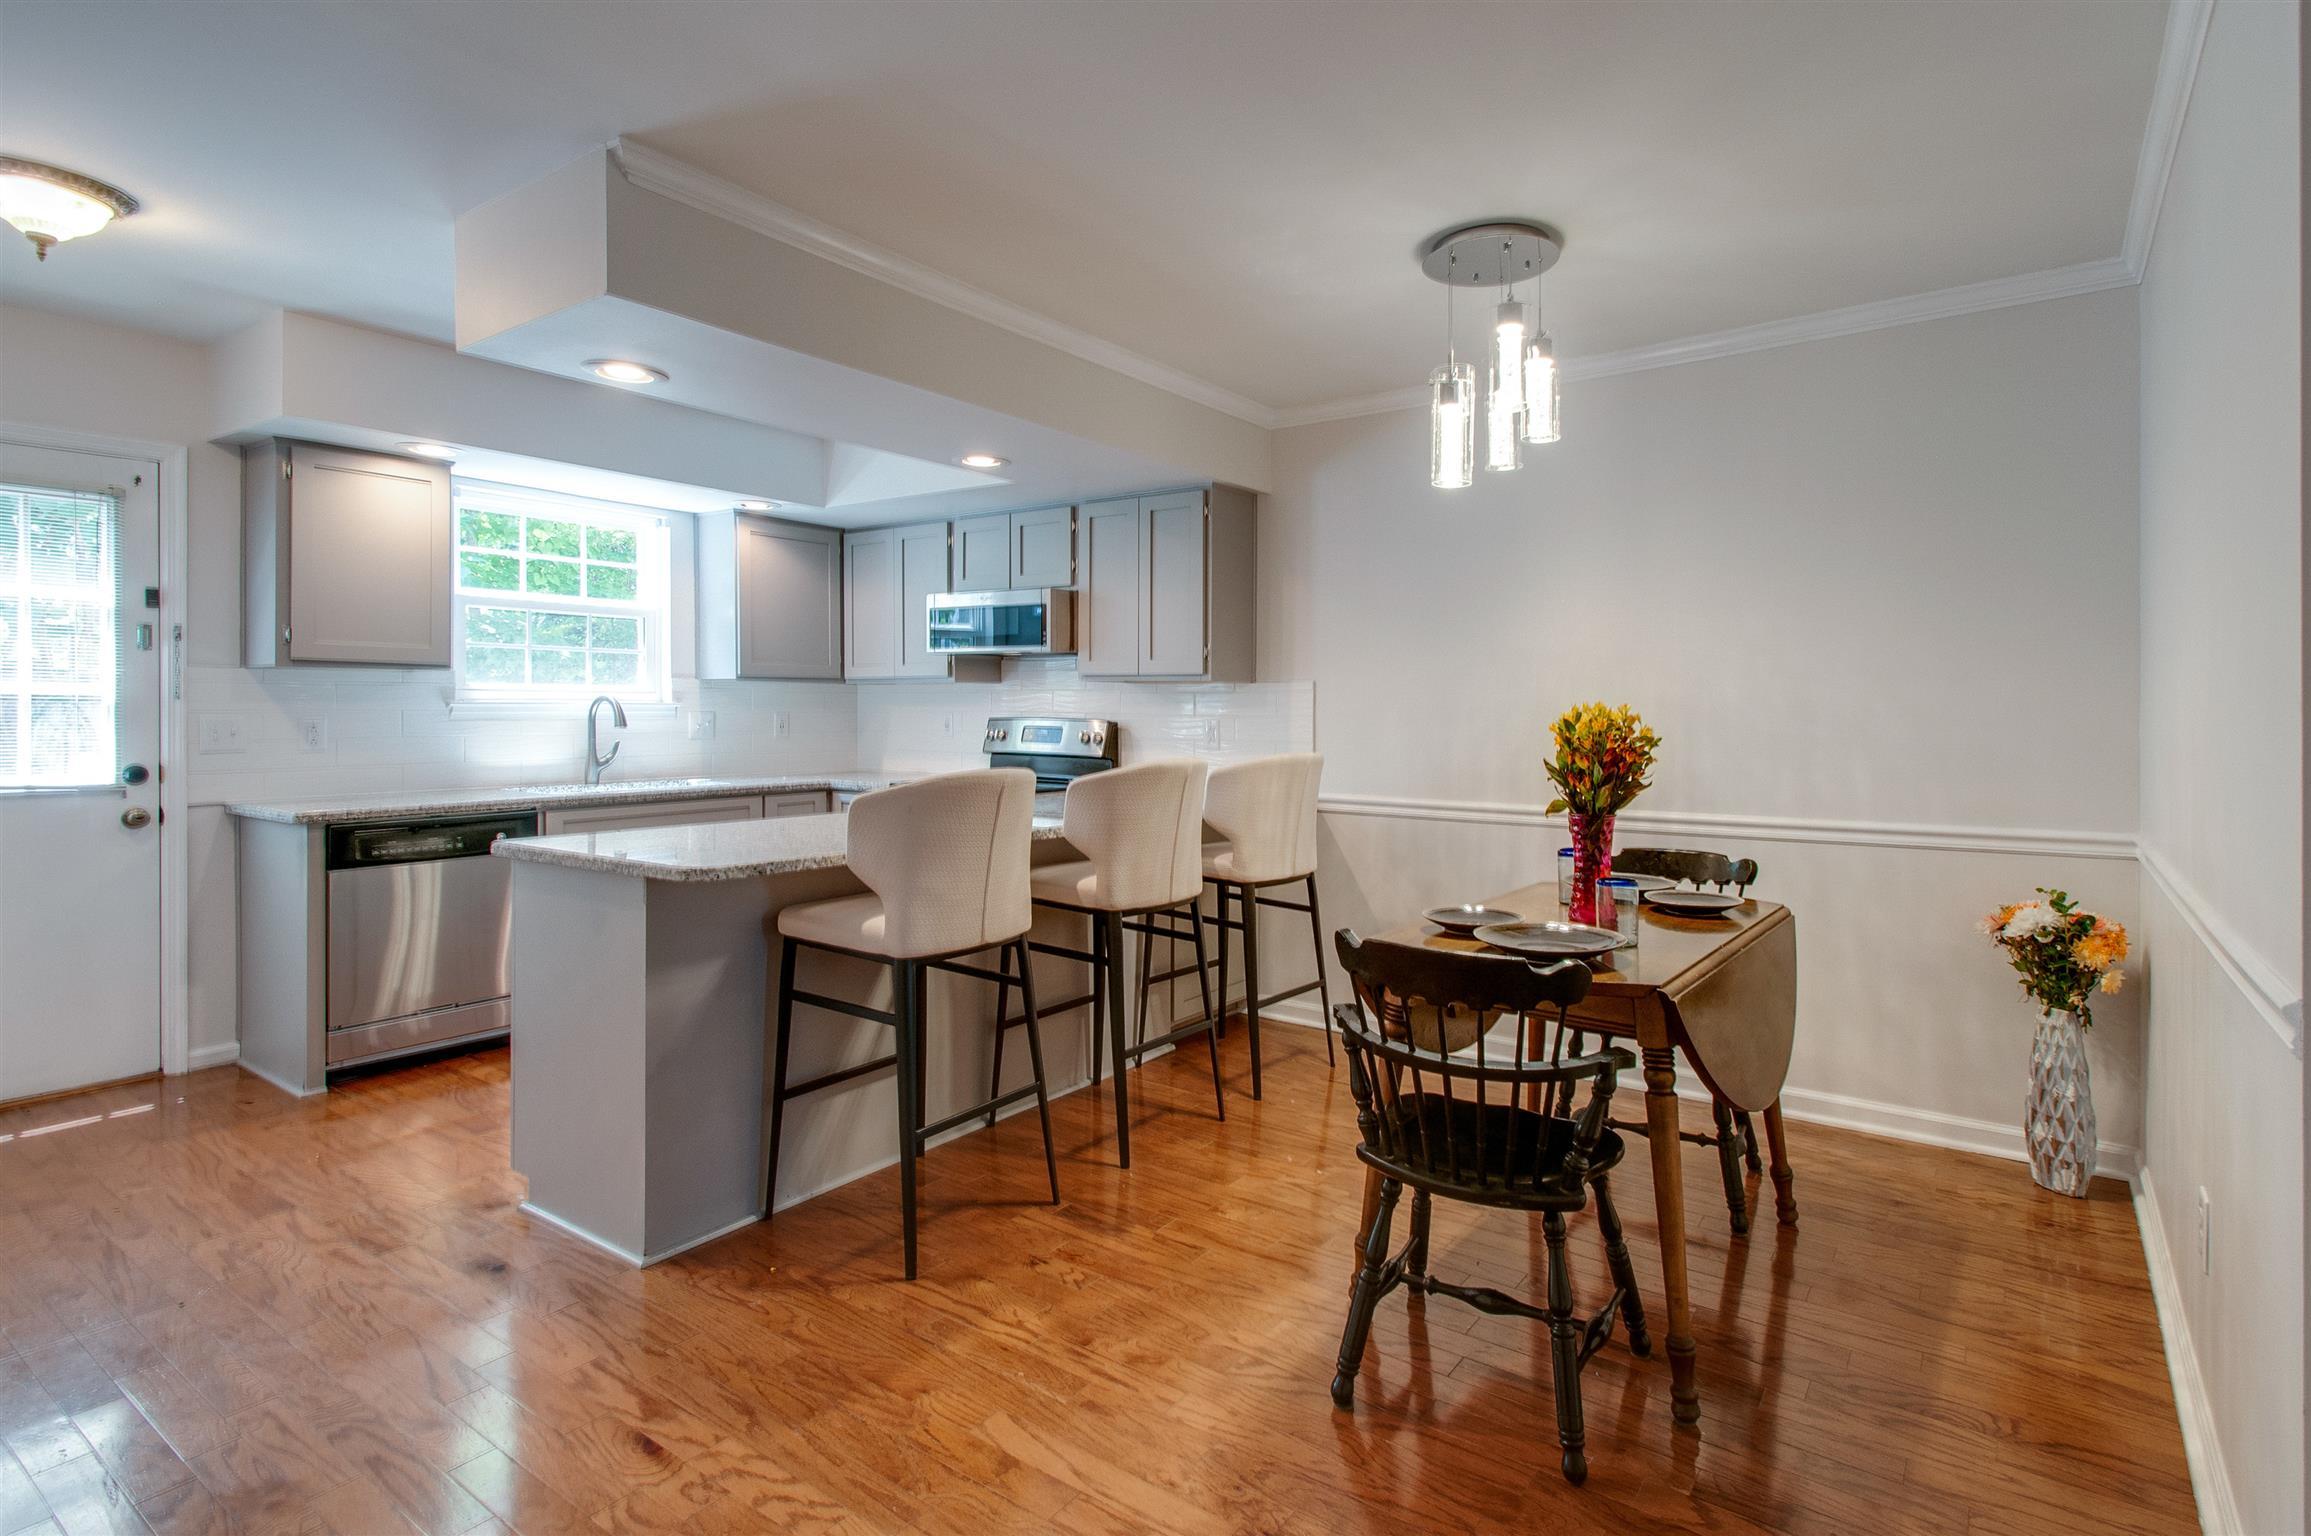 2709 Linmar Ave Apt 6, Nashville, TN 37215 - Nashville, TN real estate listing